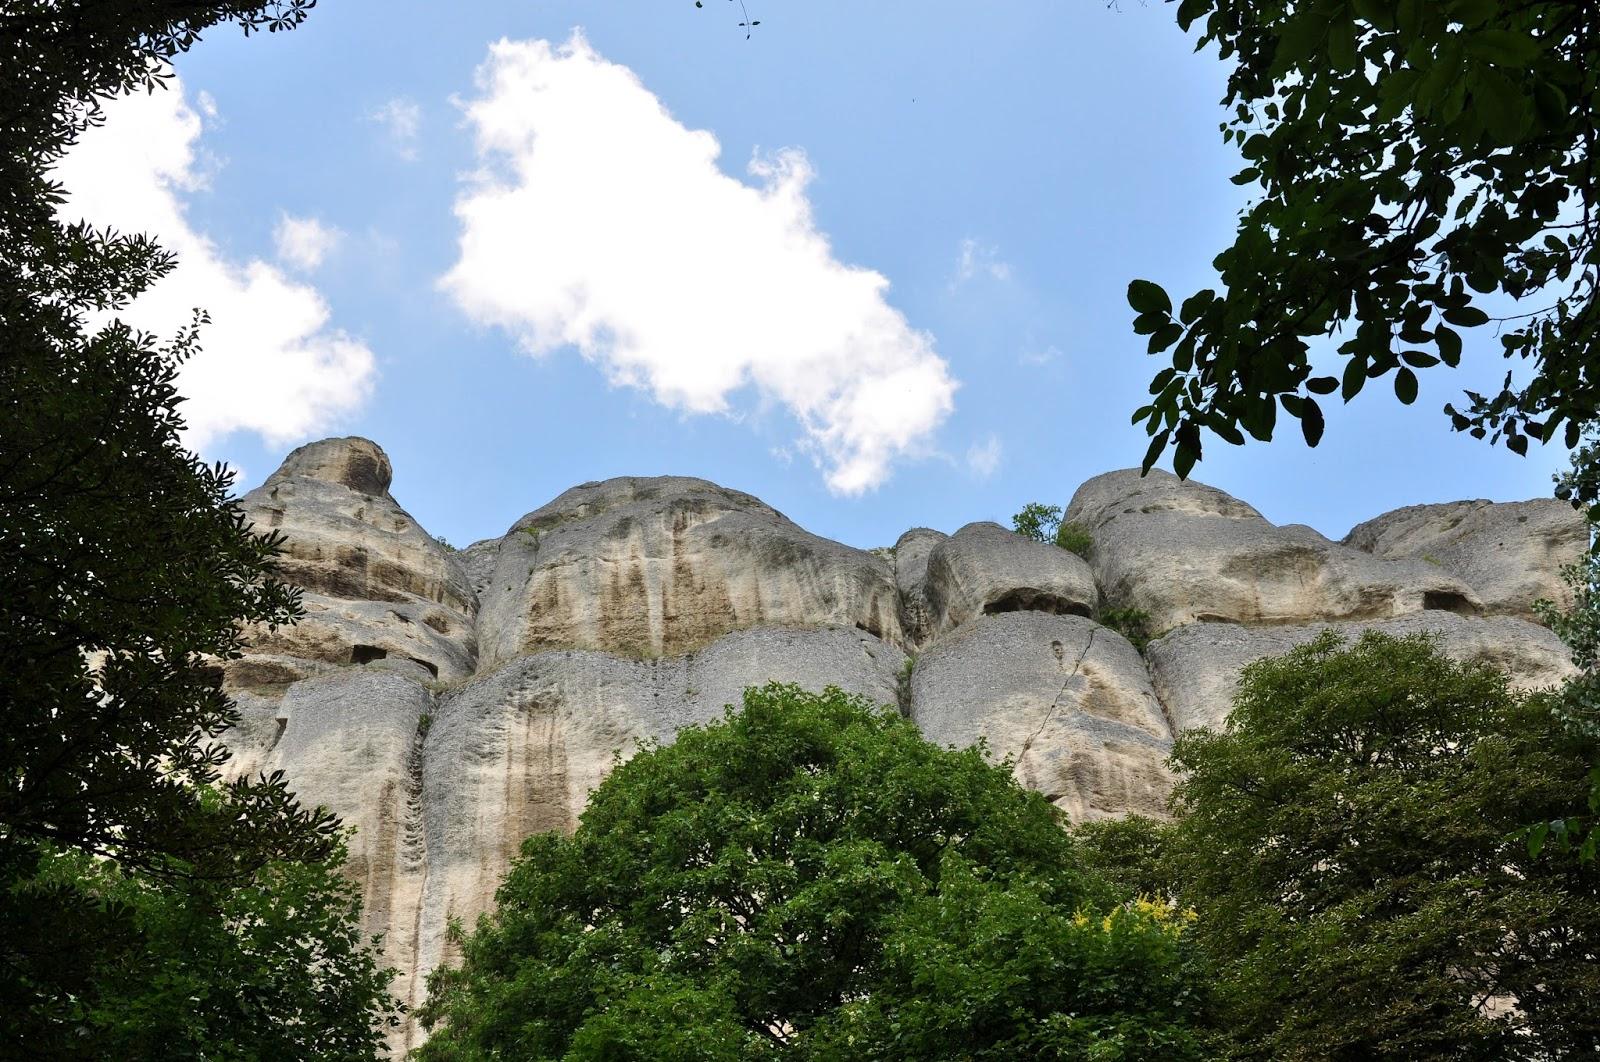 The rocks, Madara, Bulgaria